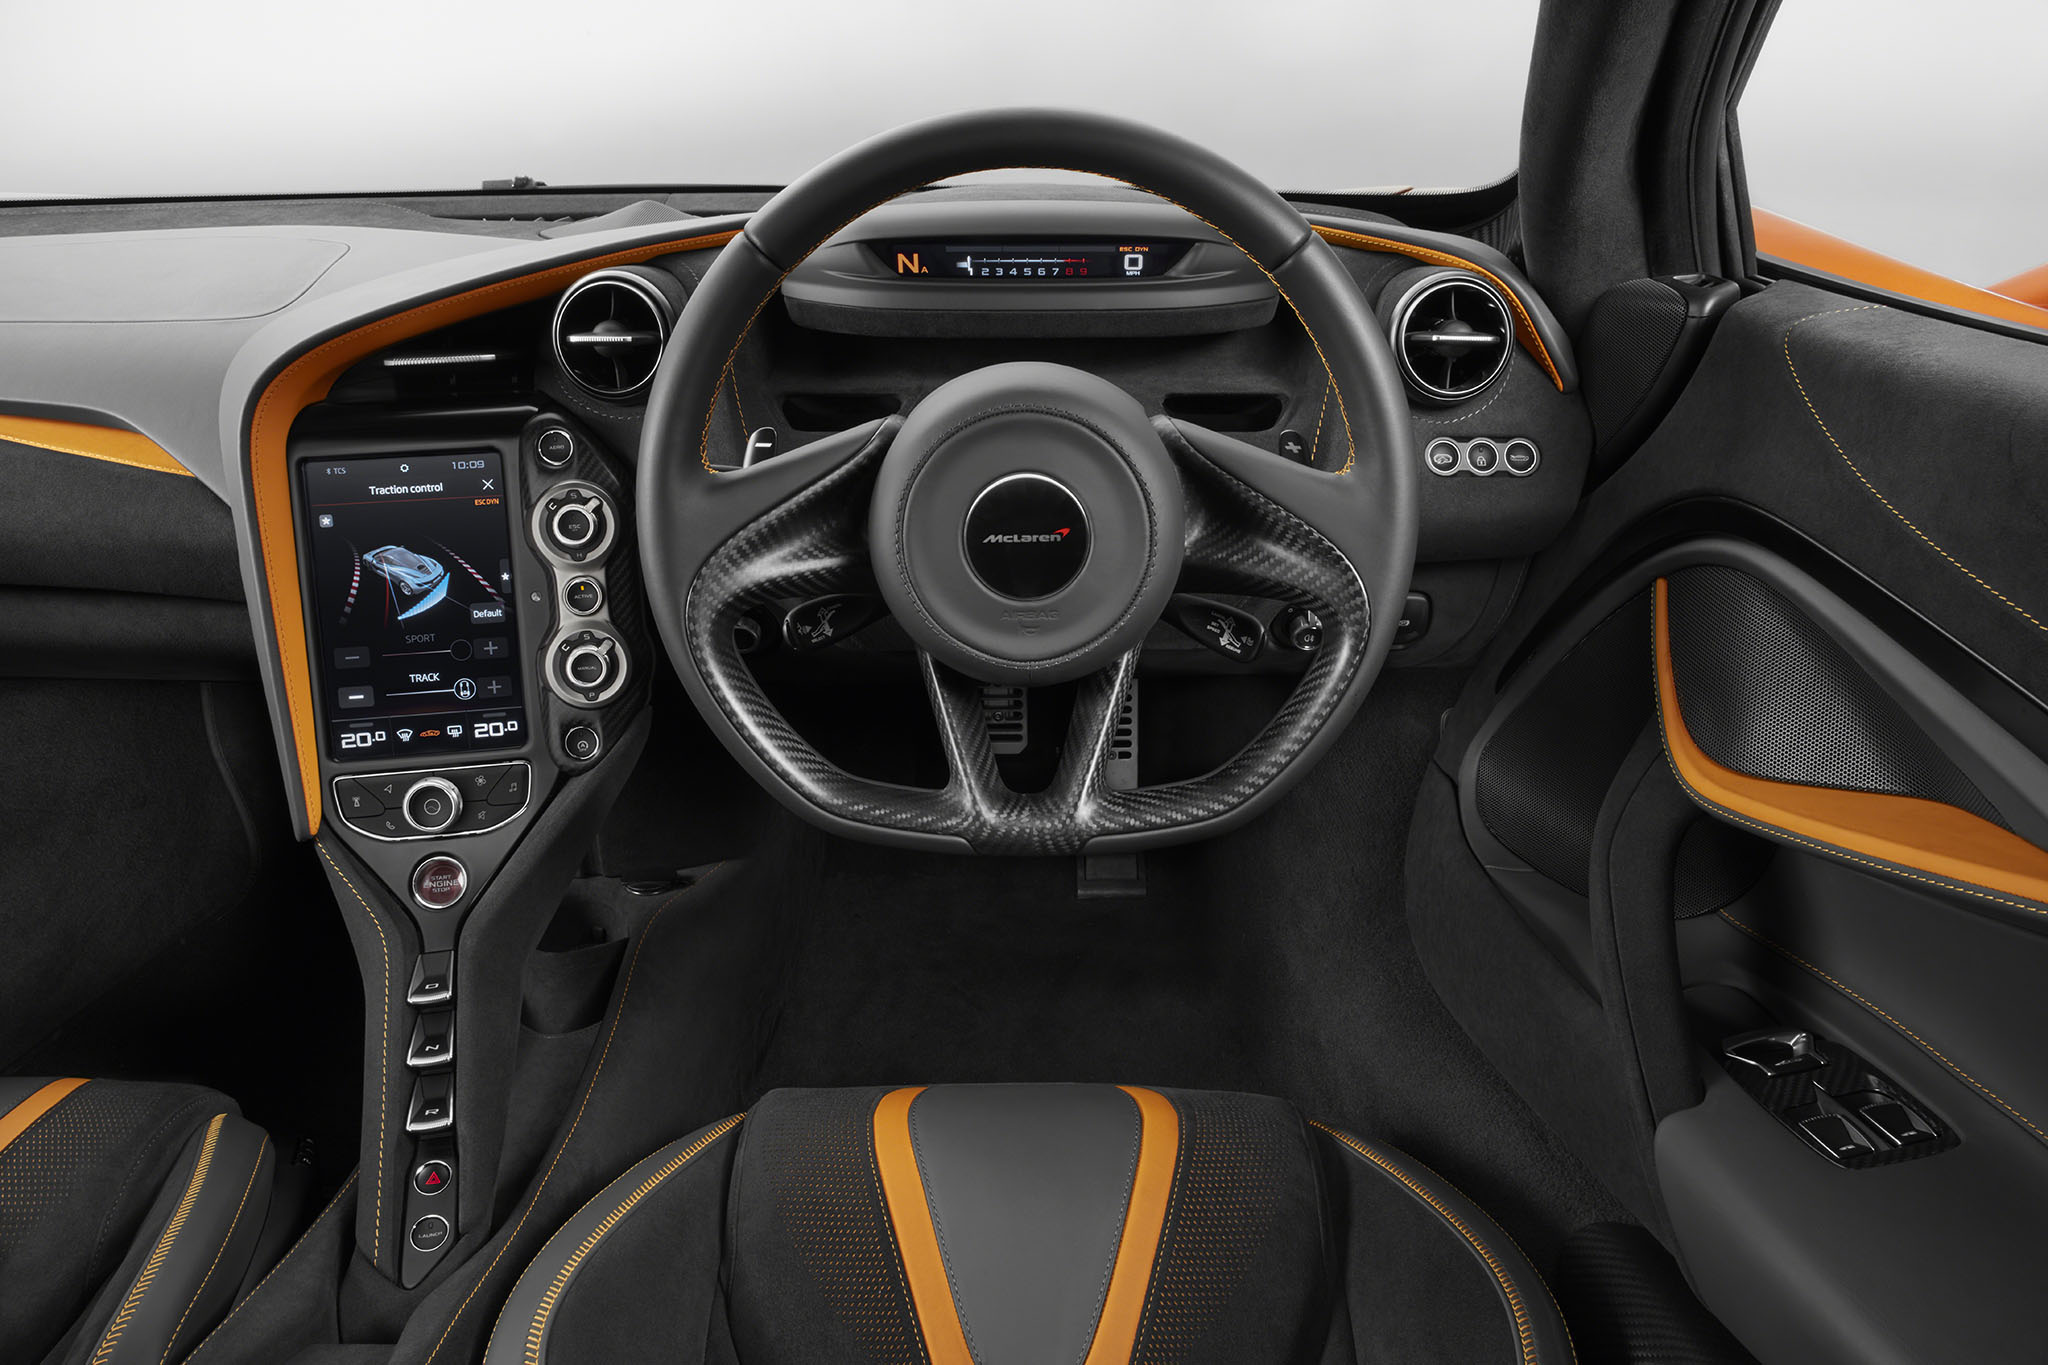 https://st.automobilemag.com/uploads/sites/11/2017/03/2018-McLaren-720S-Interior-POV-Screen-Down.jpg